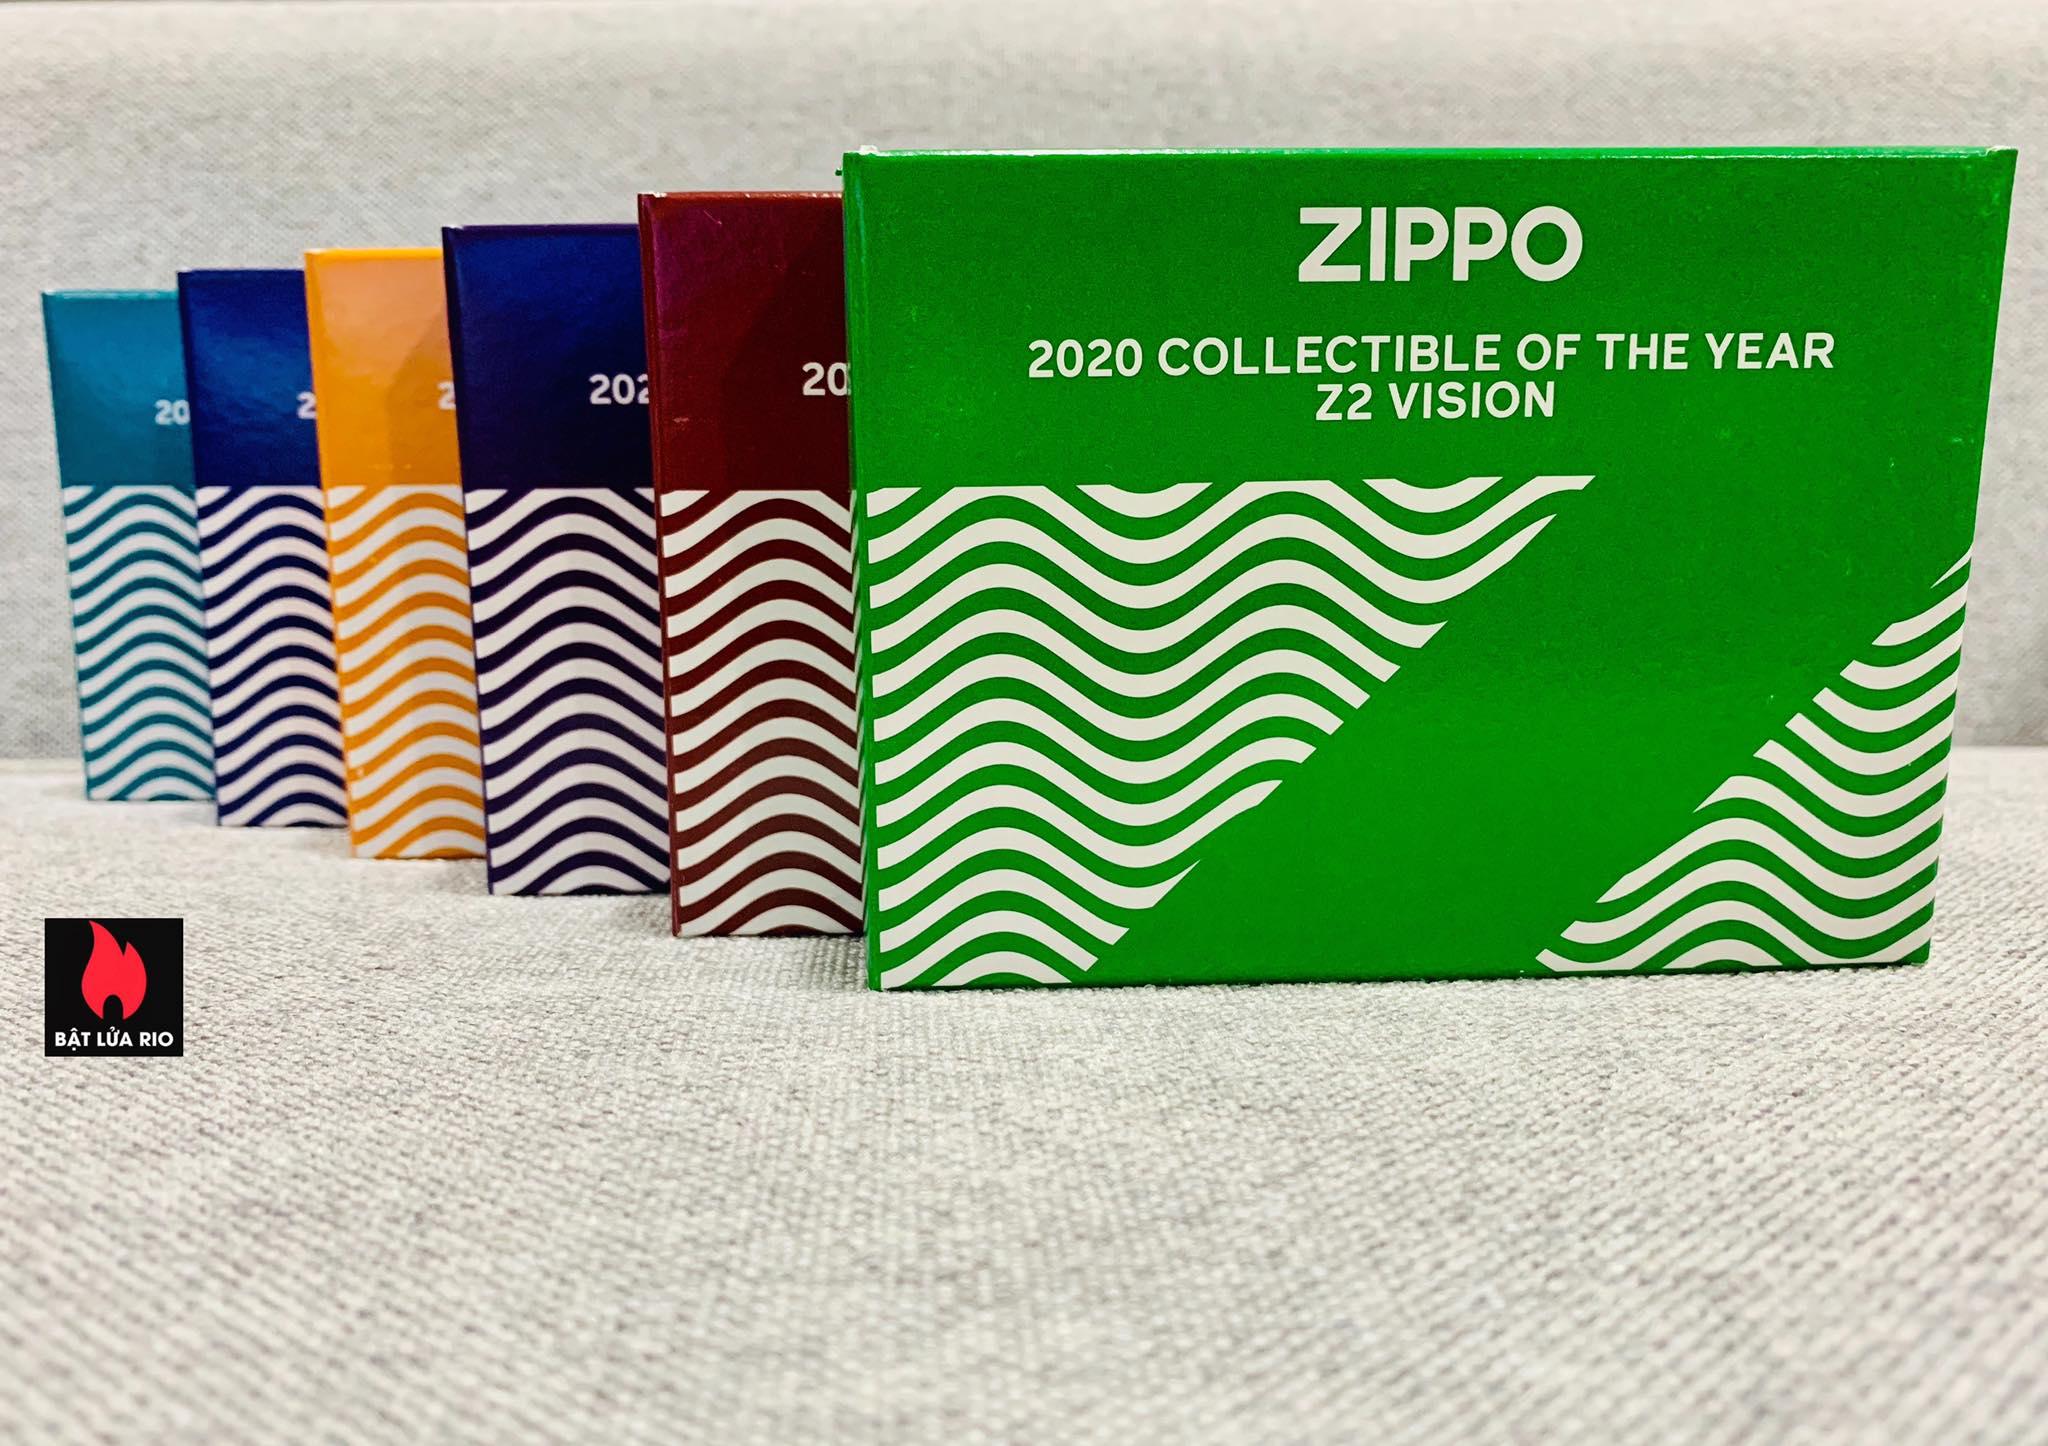 Zippo 49194 - Zippo 2020 Collectible Of The Year - Zippo Coty 2020 - Zippo Z2 Vision 19